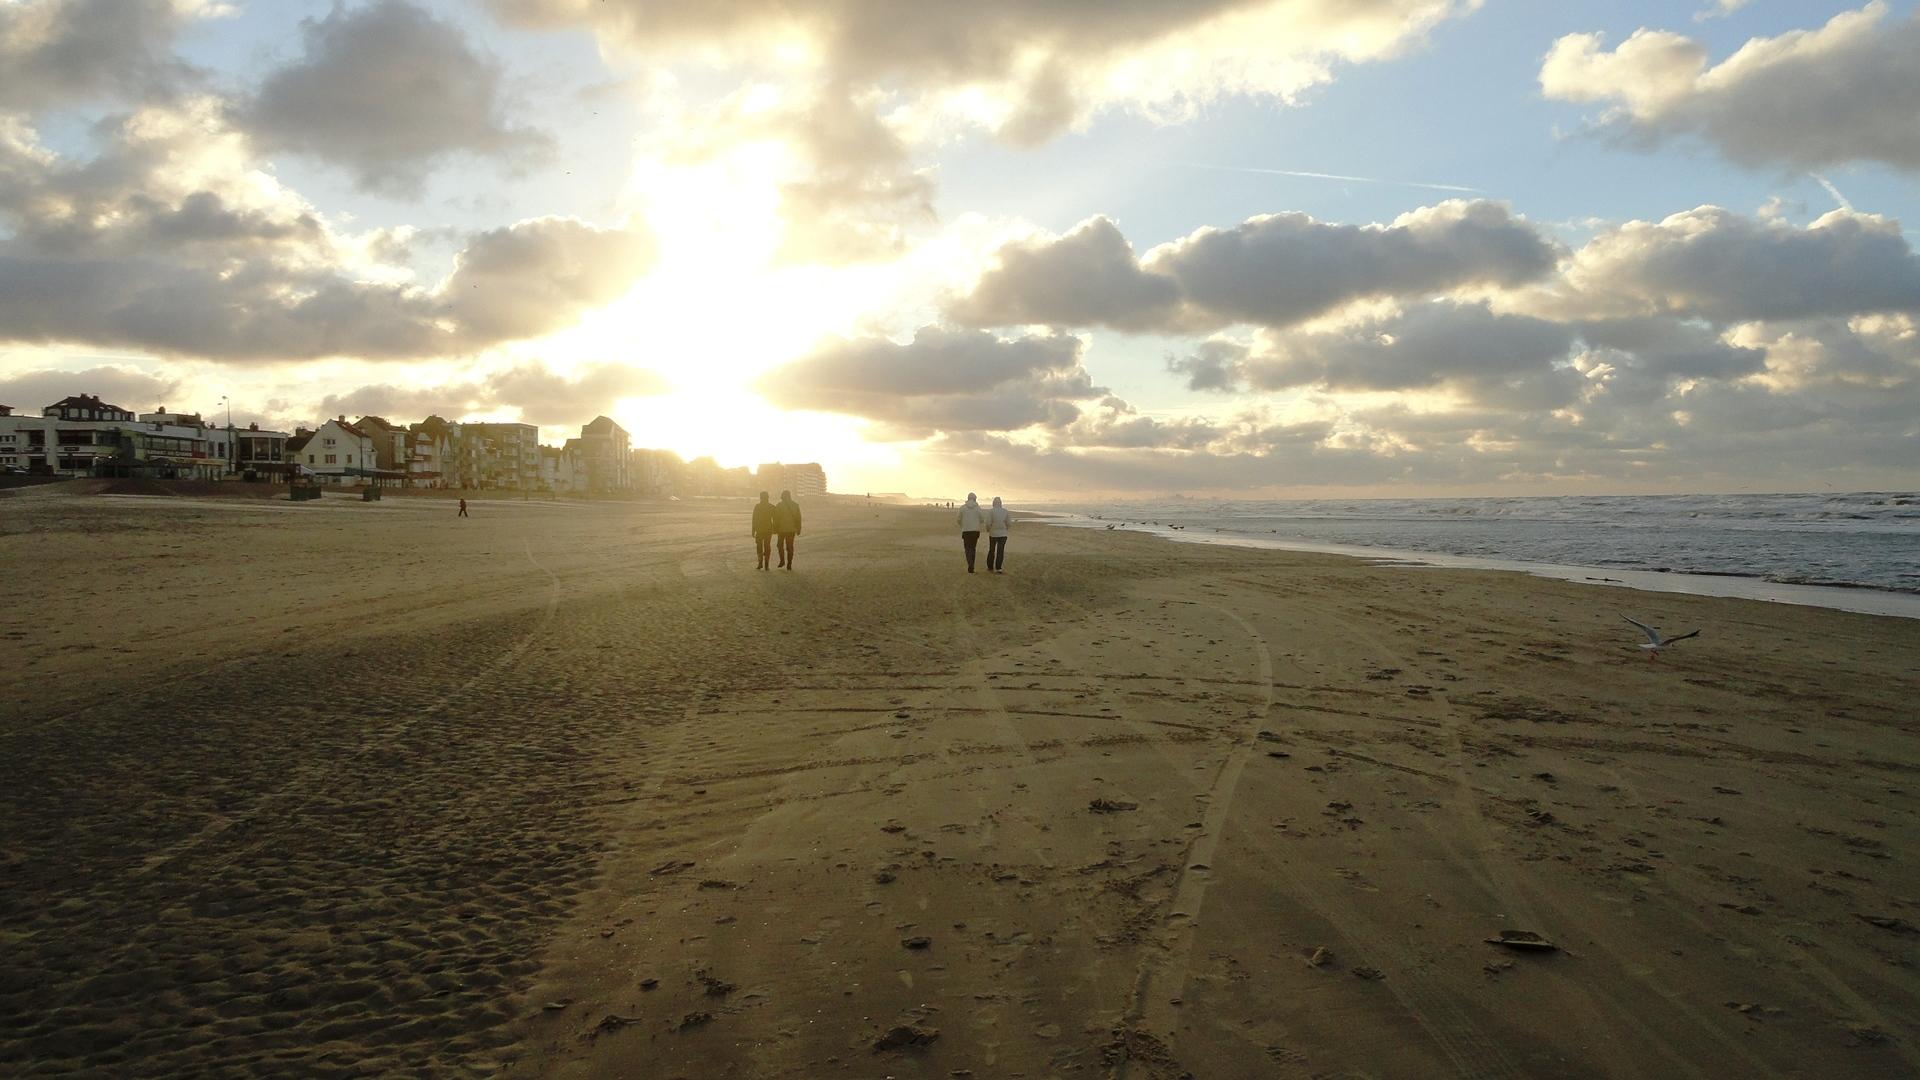 Plage de Bray-Dunes